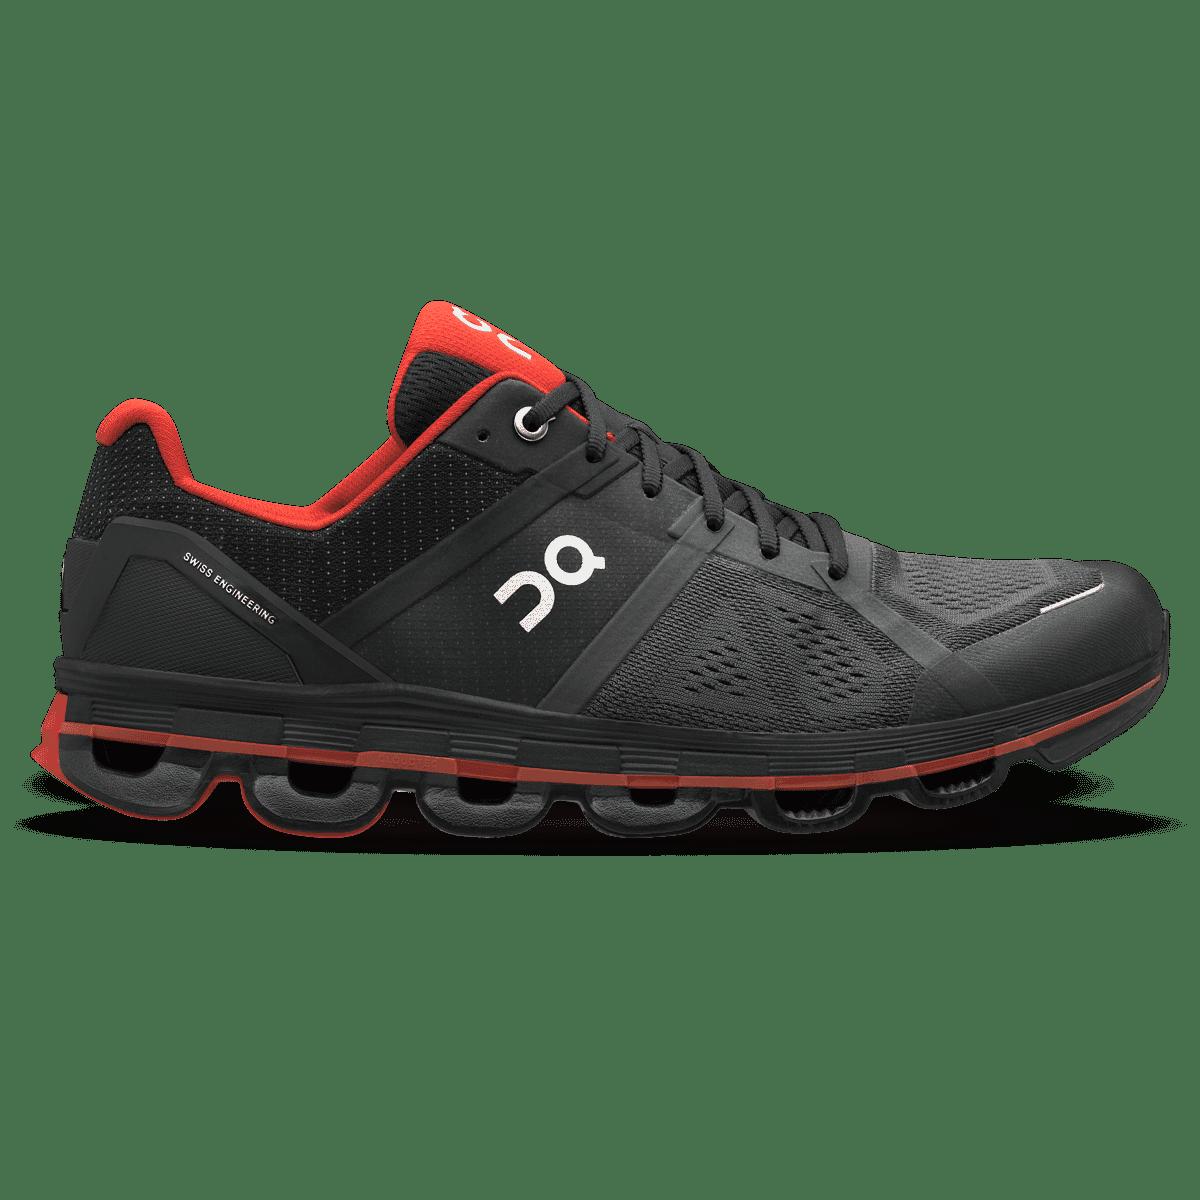 789d8d96b5dbf5 Cloudace - The Ultimate Support Running Shoe - Men